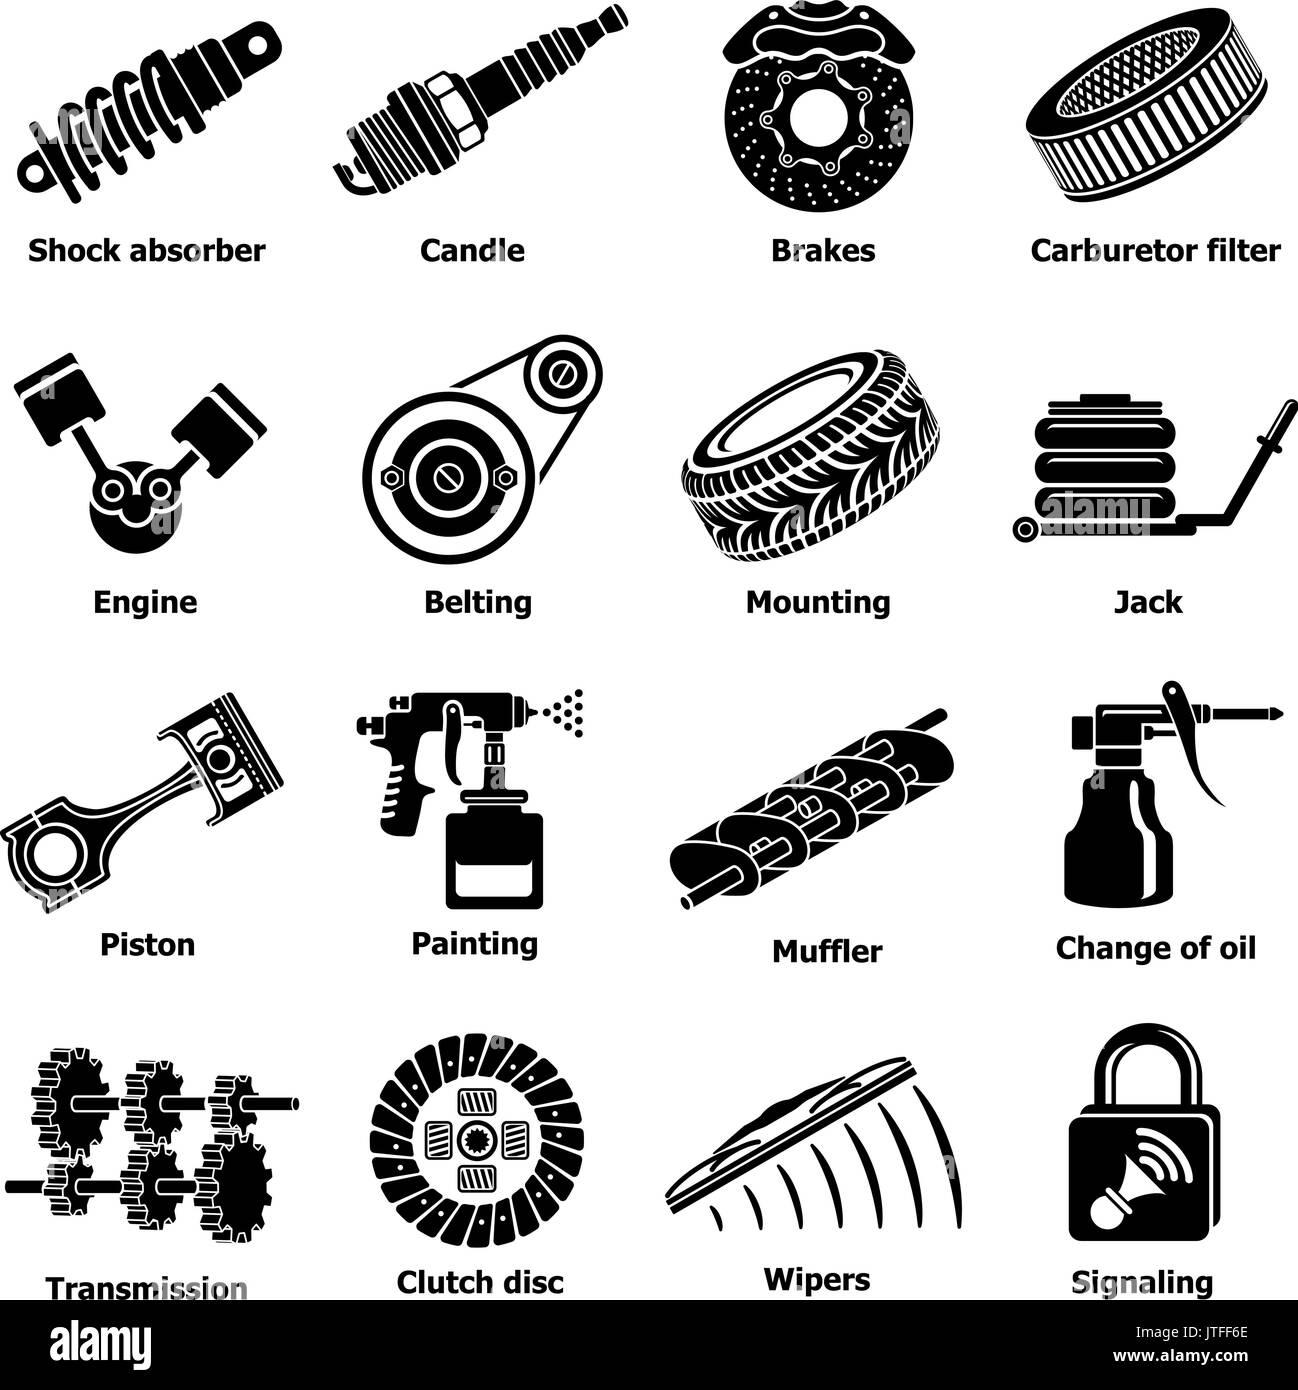 Car repair parts icons set, simple style Stock Vector Art ...